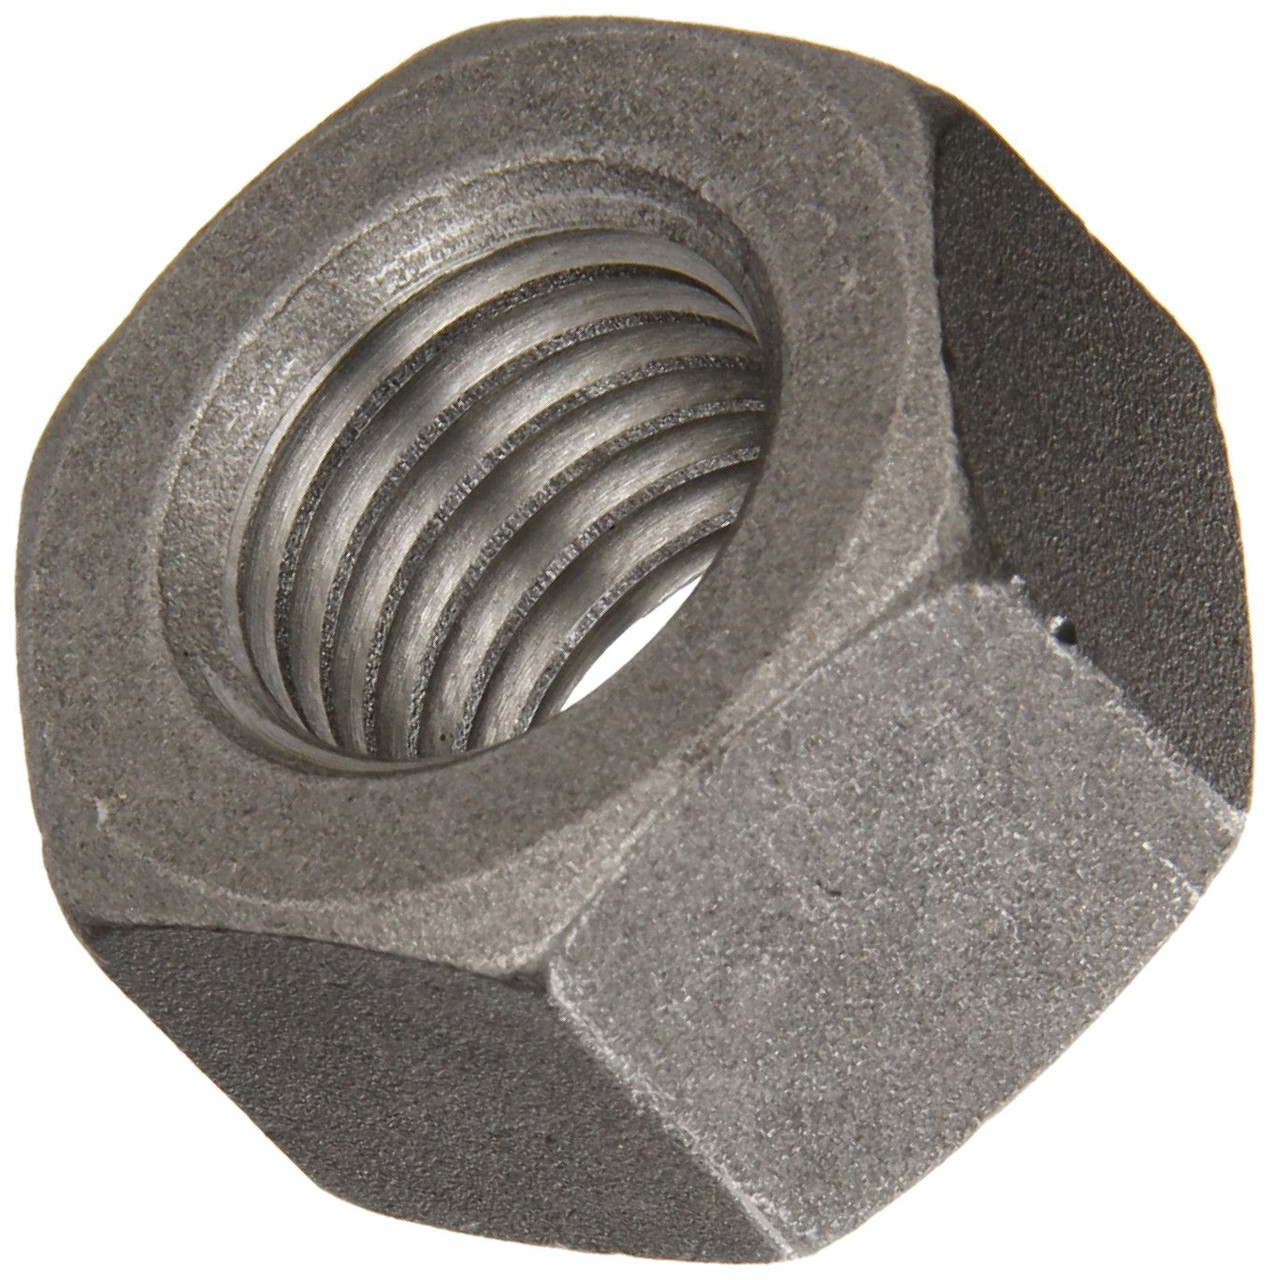 Гайка М16, кл.пр. 10.9, сталь 40Х Селект, ГОСТ Р 52645-2006